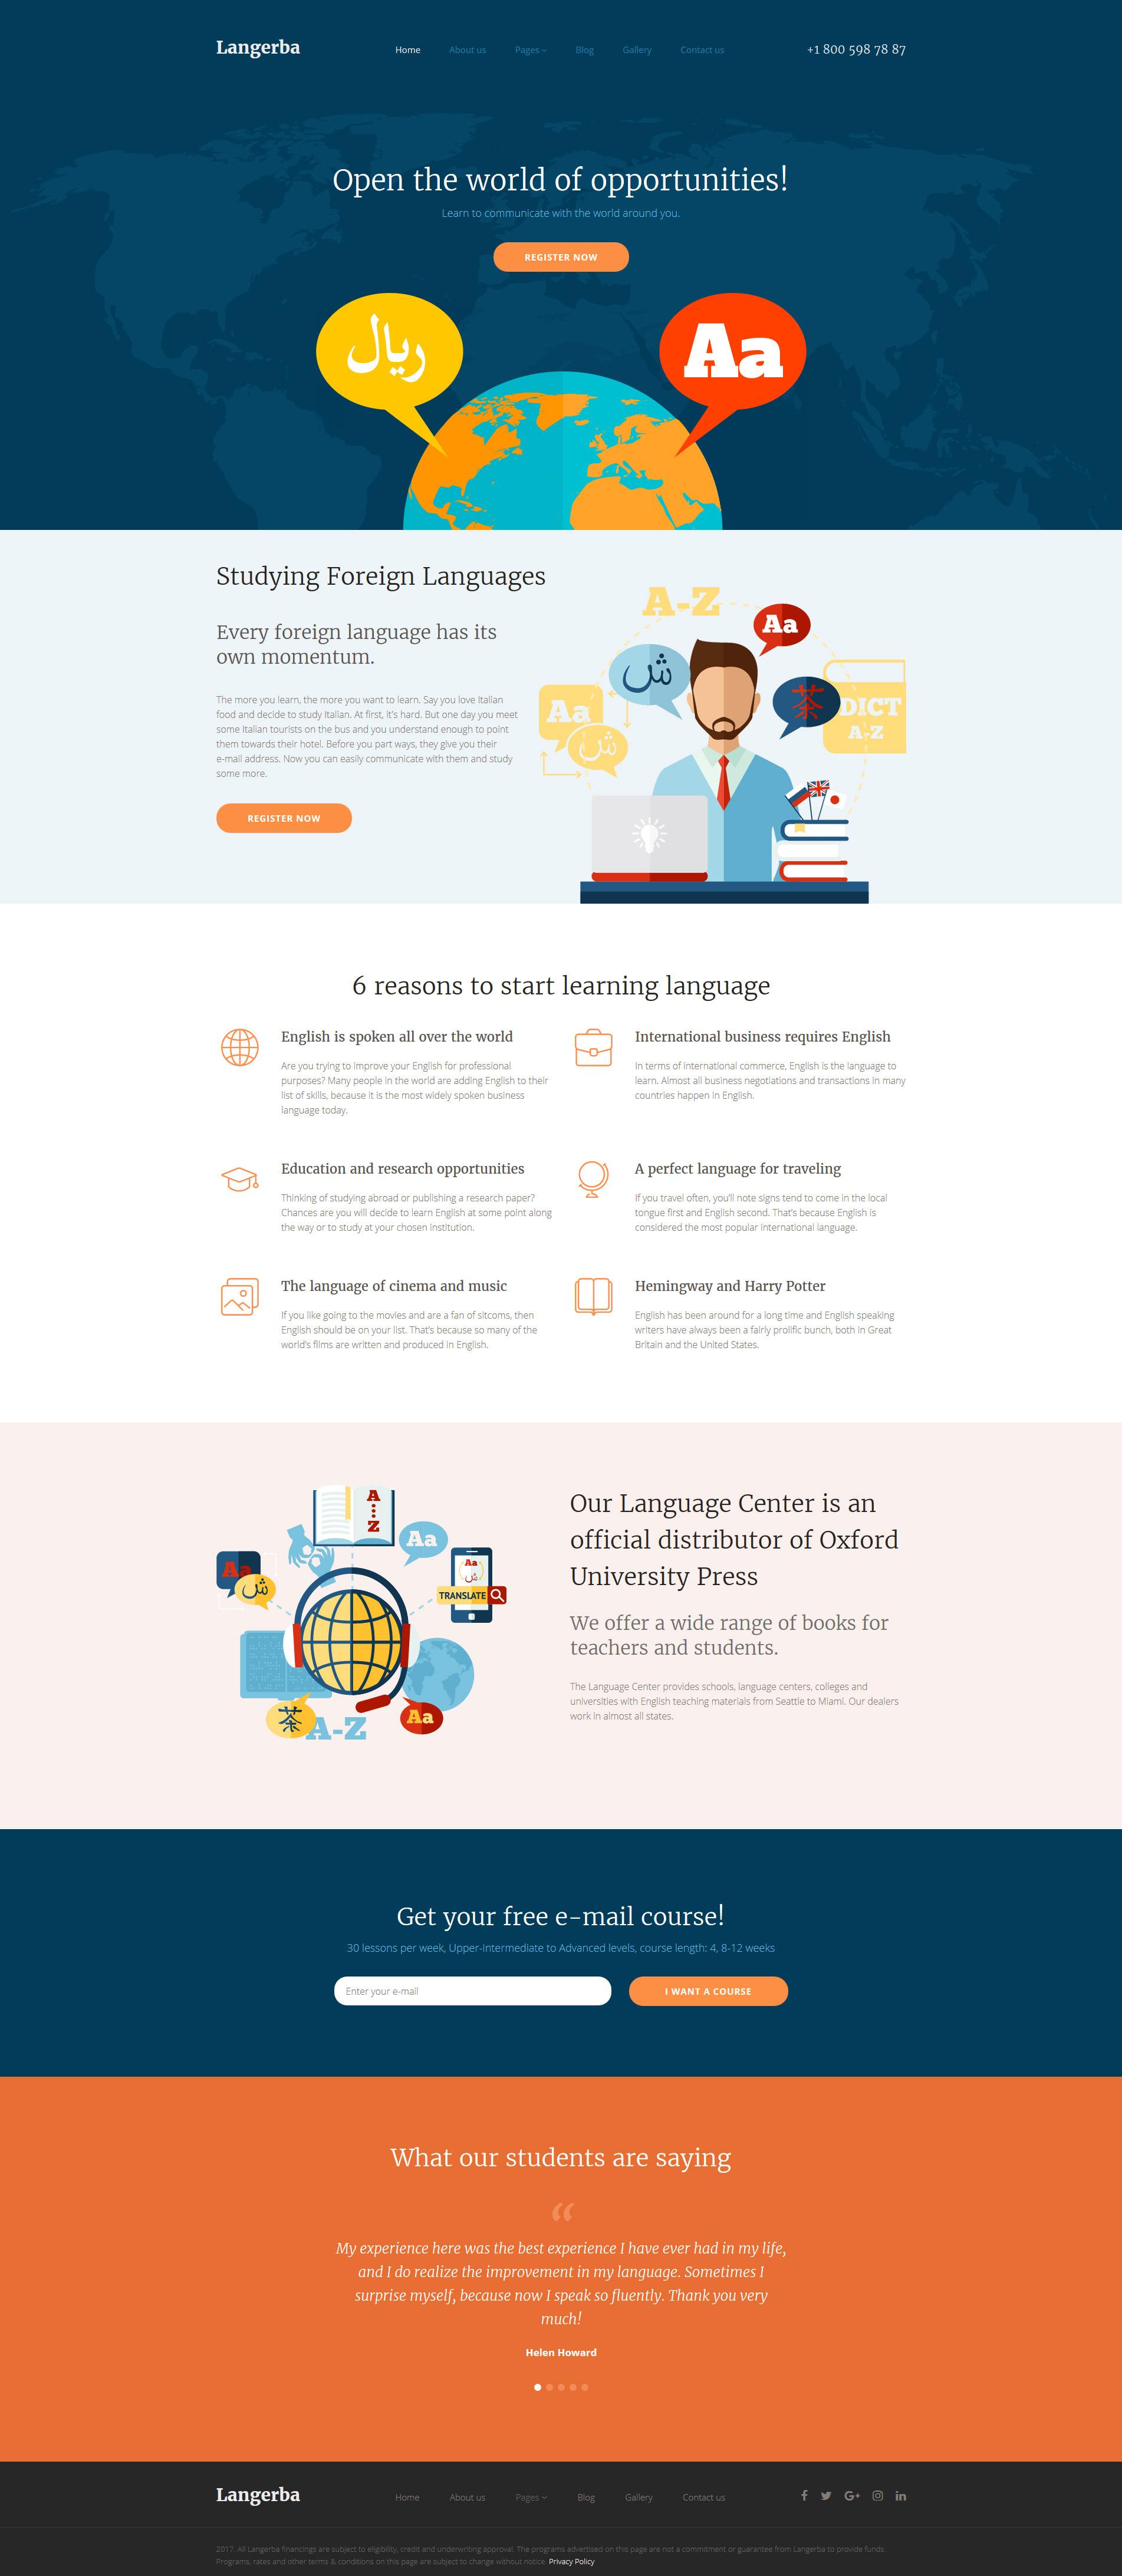 Langerba - Language School №62066 - скриншот